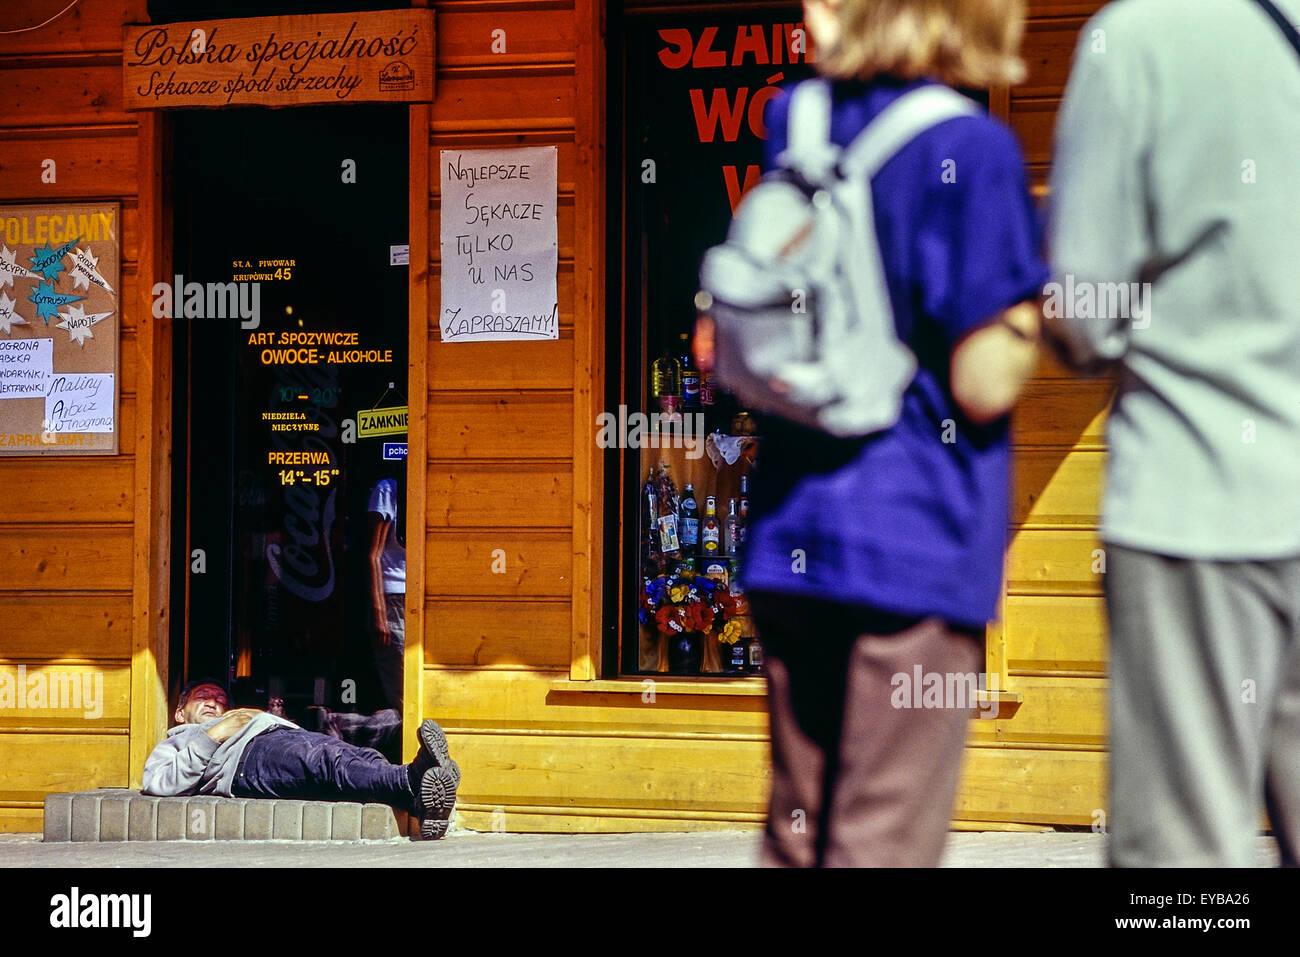 A man asleep in the doorway of a vodka store. Zakopane. Poland. - Stock Image